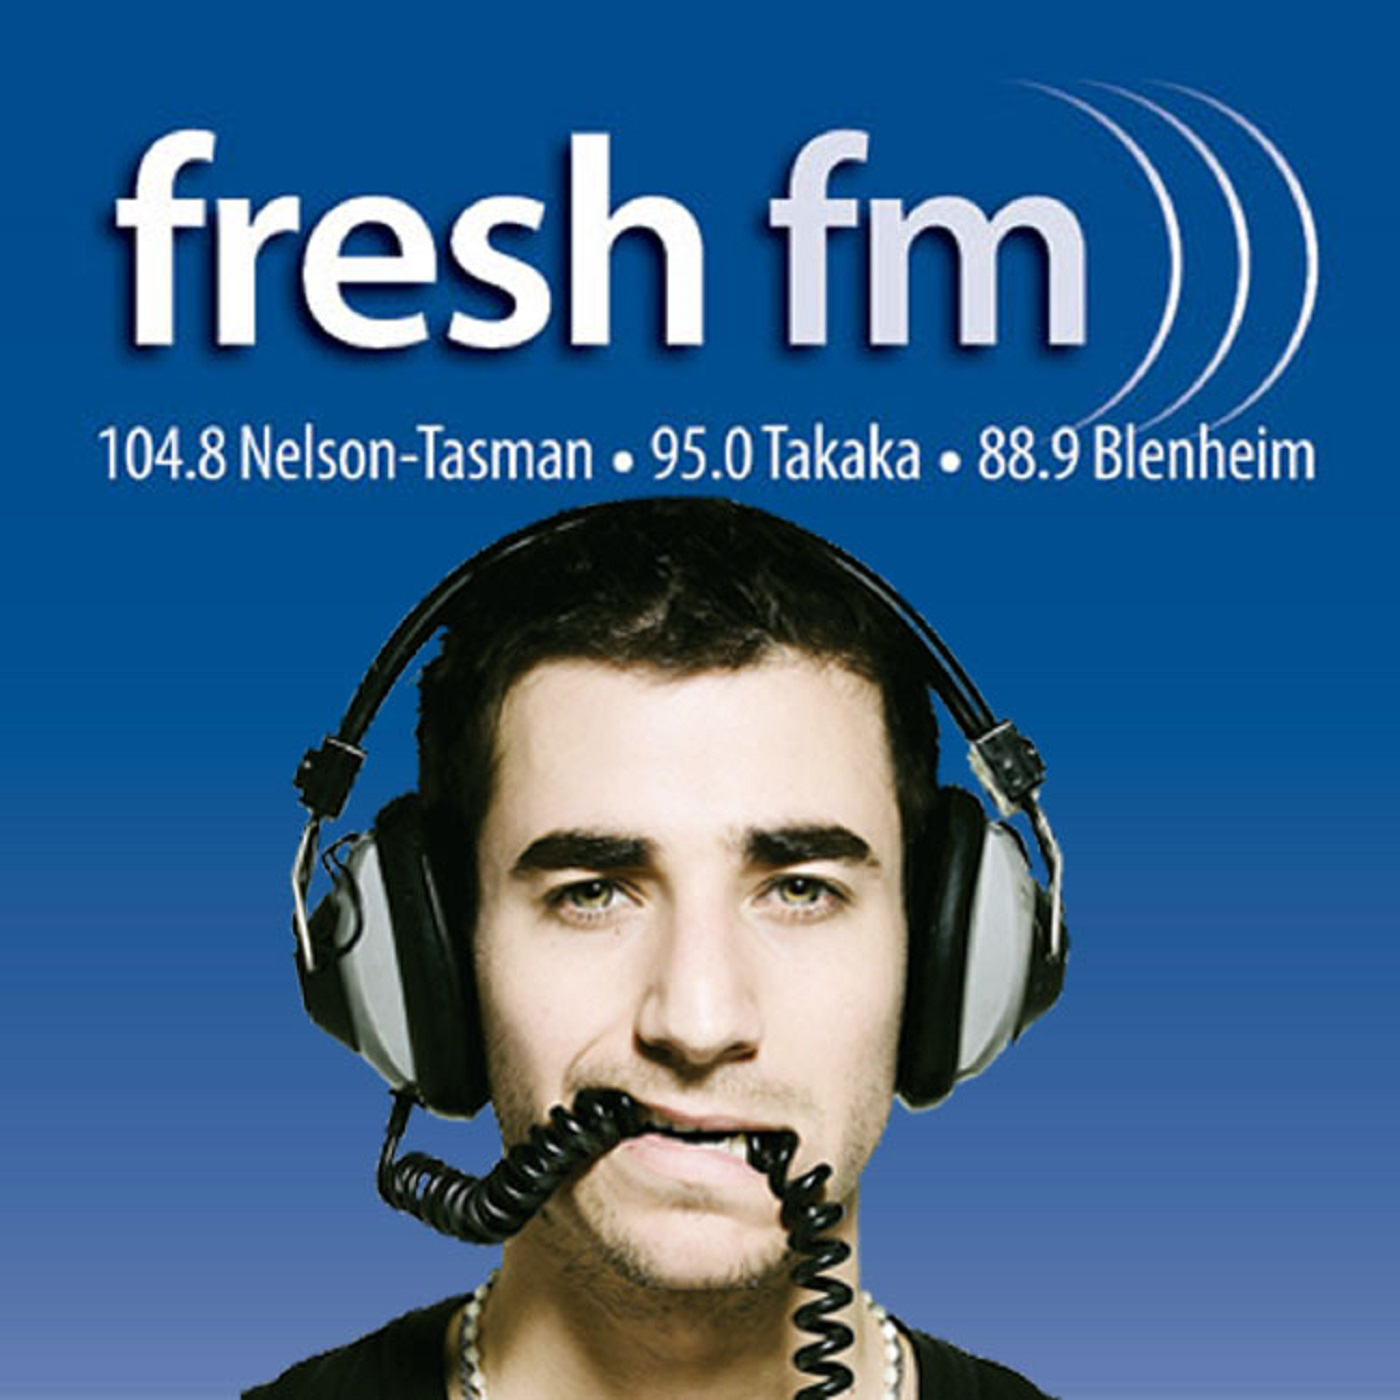 https://static.accessradio.org/StationFolder/freshfm/Images/Fresh-FM-Art140020.png